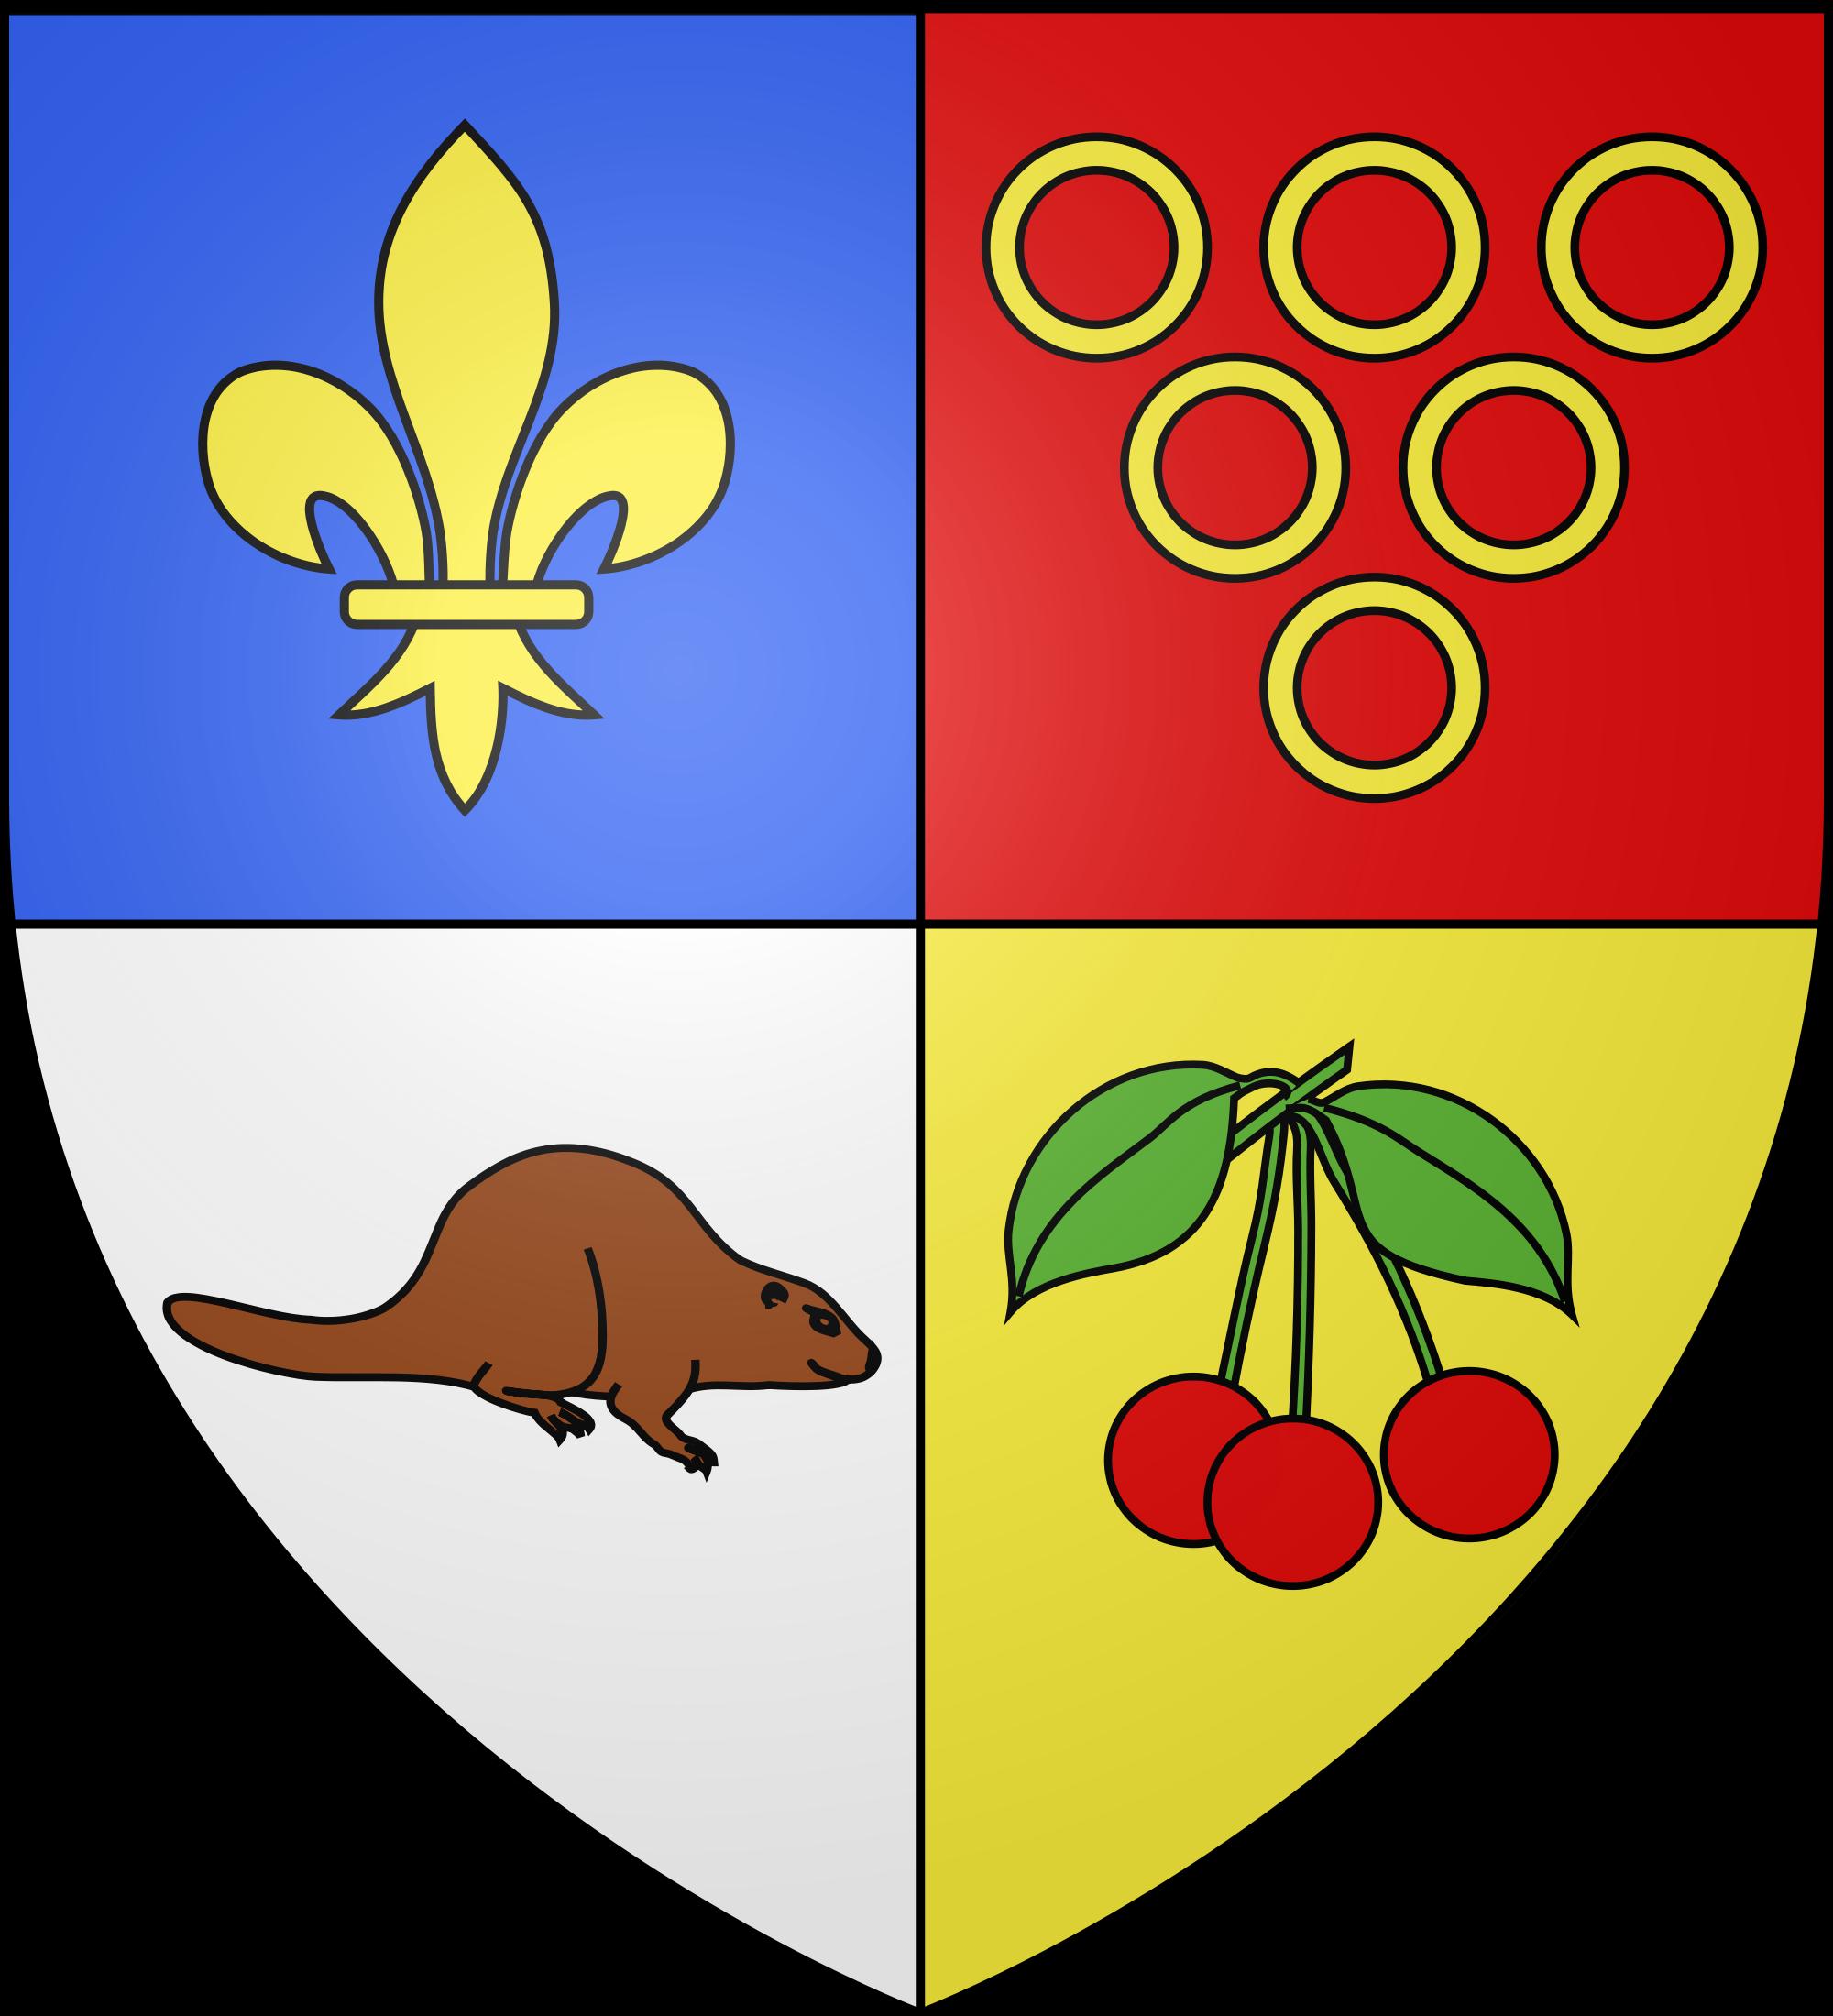 File:Blason ville fr Guyancourt (Yvelines).svg.